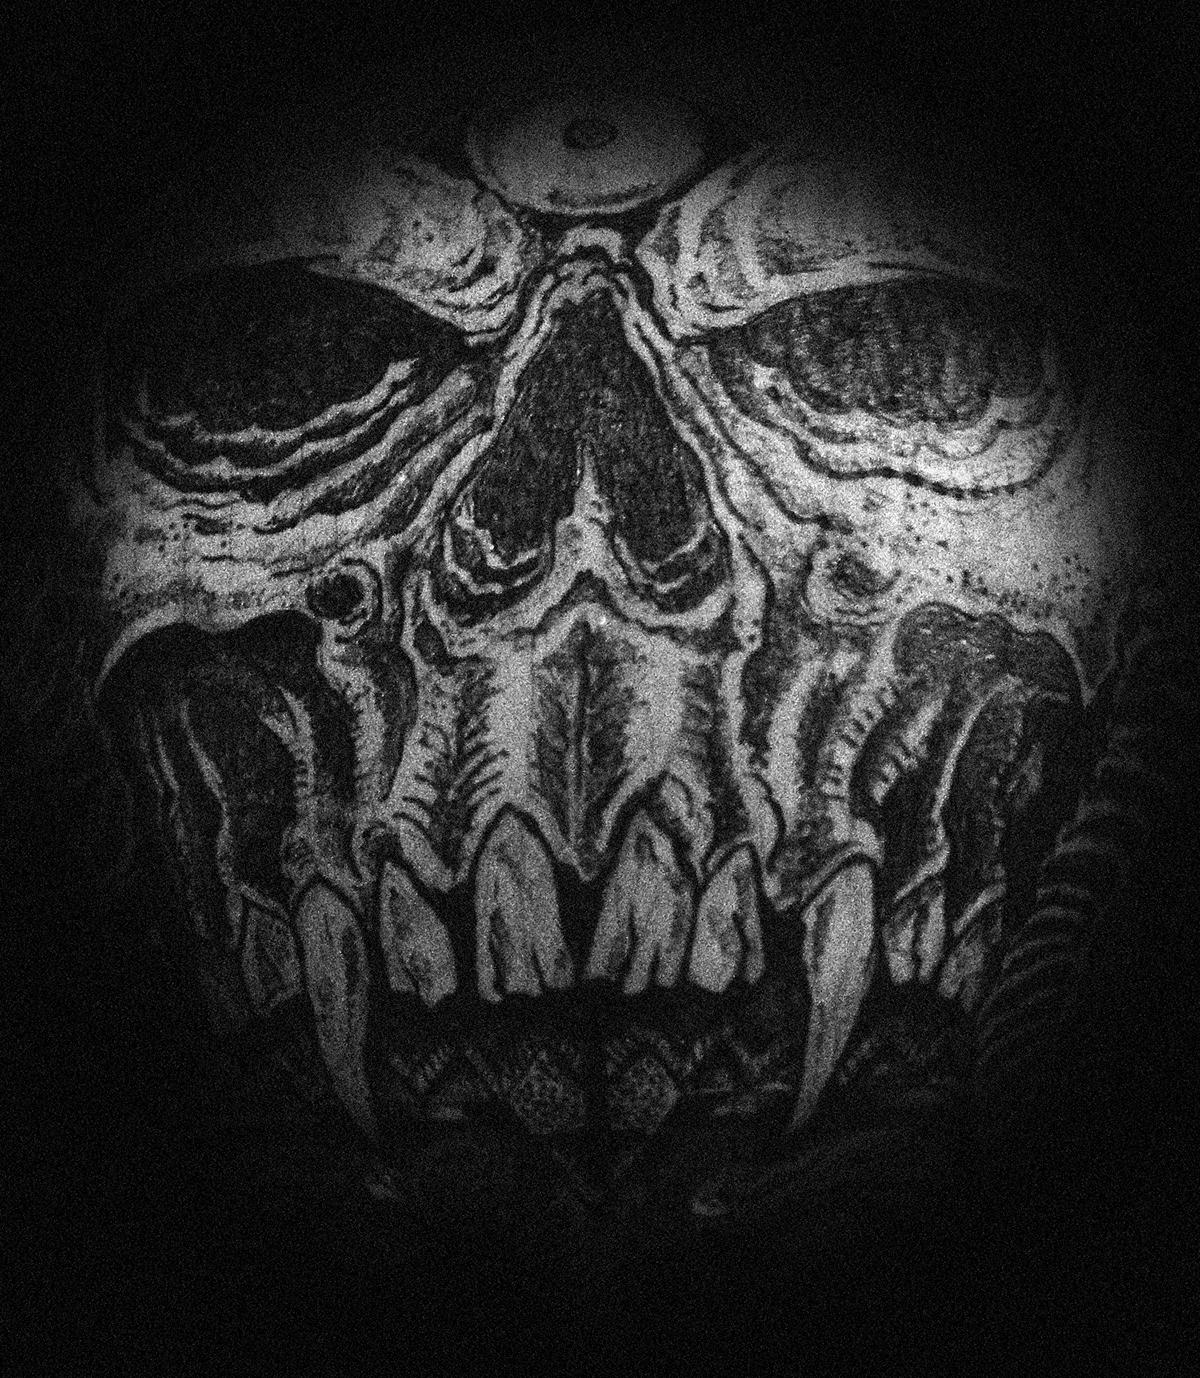 believethedogma skateboard wall Lamp santacruz skull devil prist girl Mouth ritual death dark surrealism